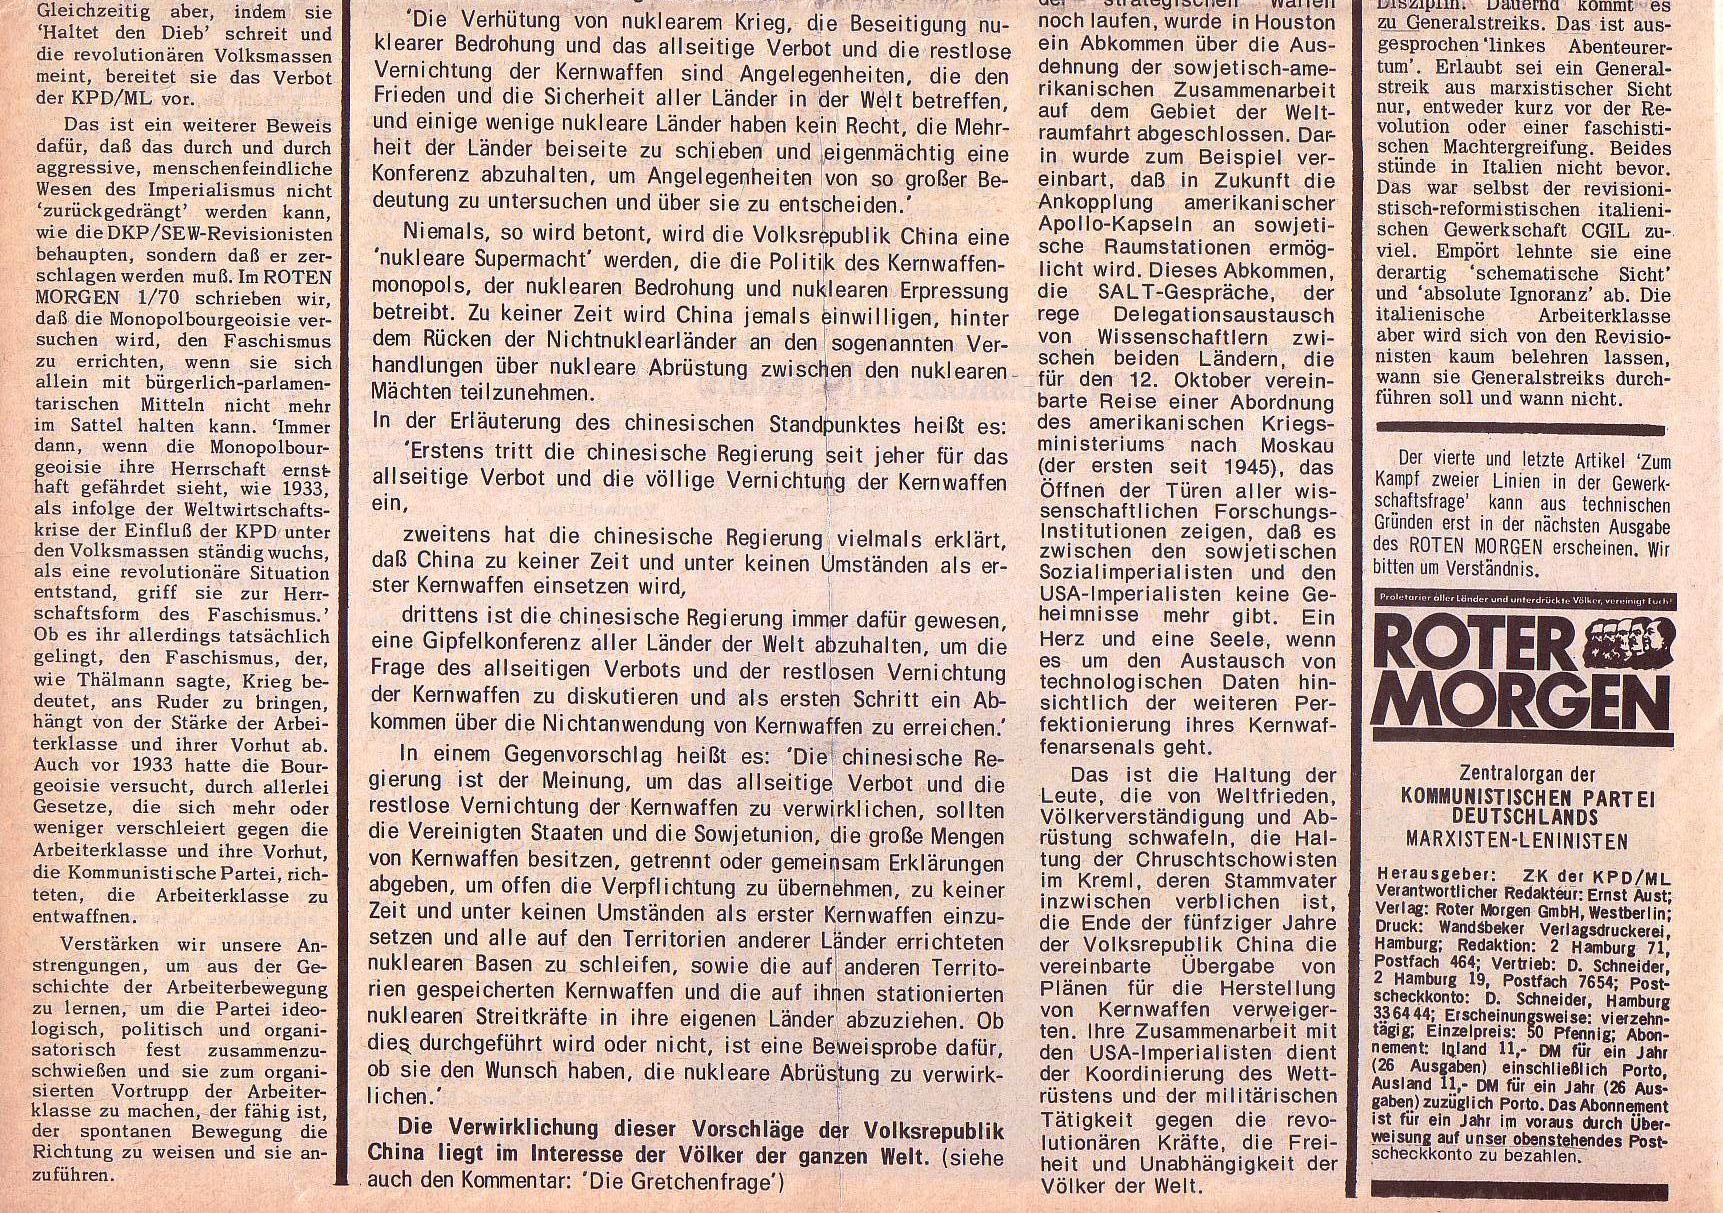 Roter Morgen, 5. Jg., 27. September 1971, Nr. 10, Seite 2b